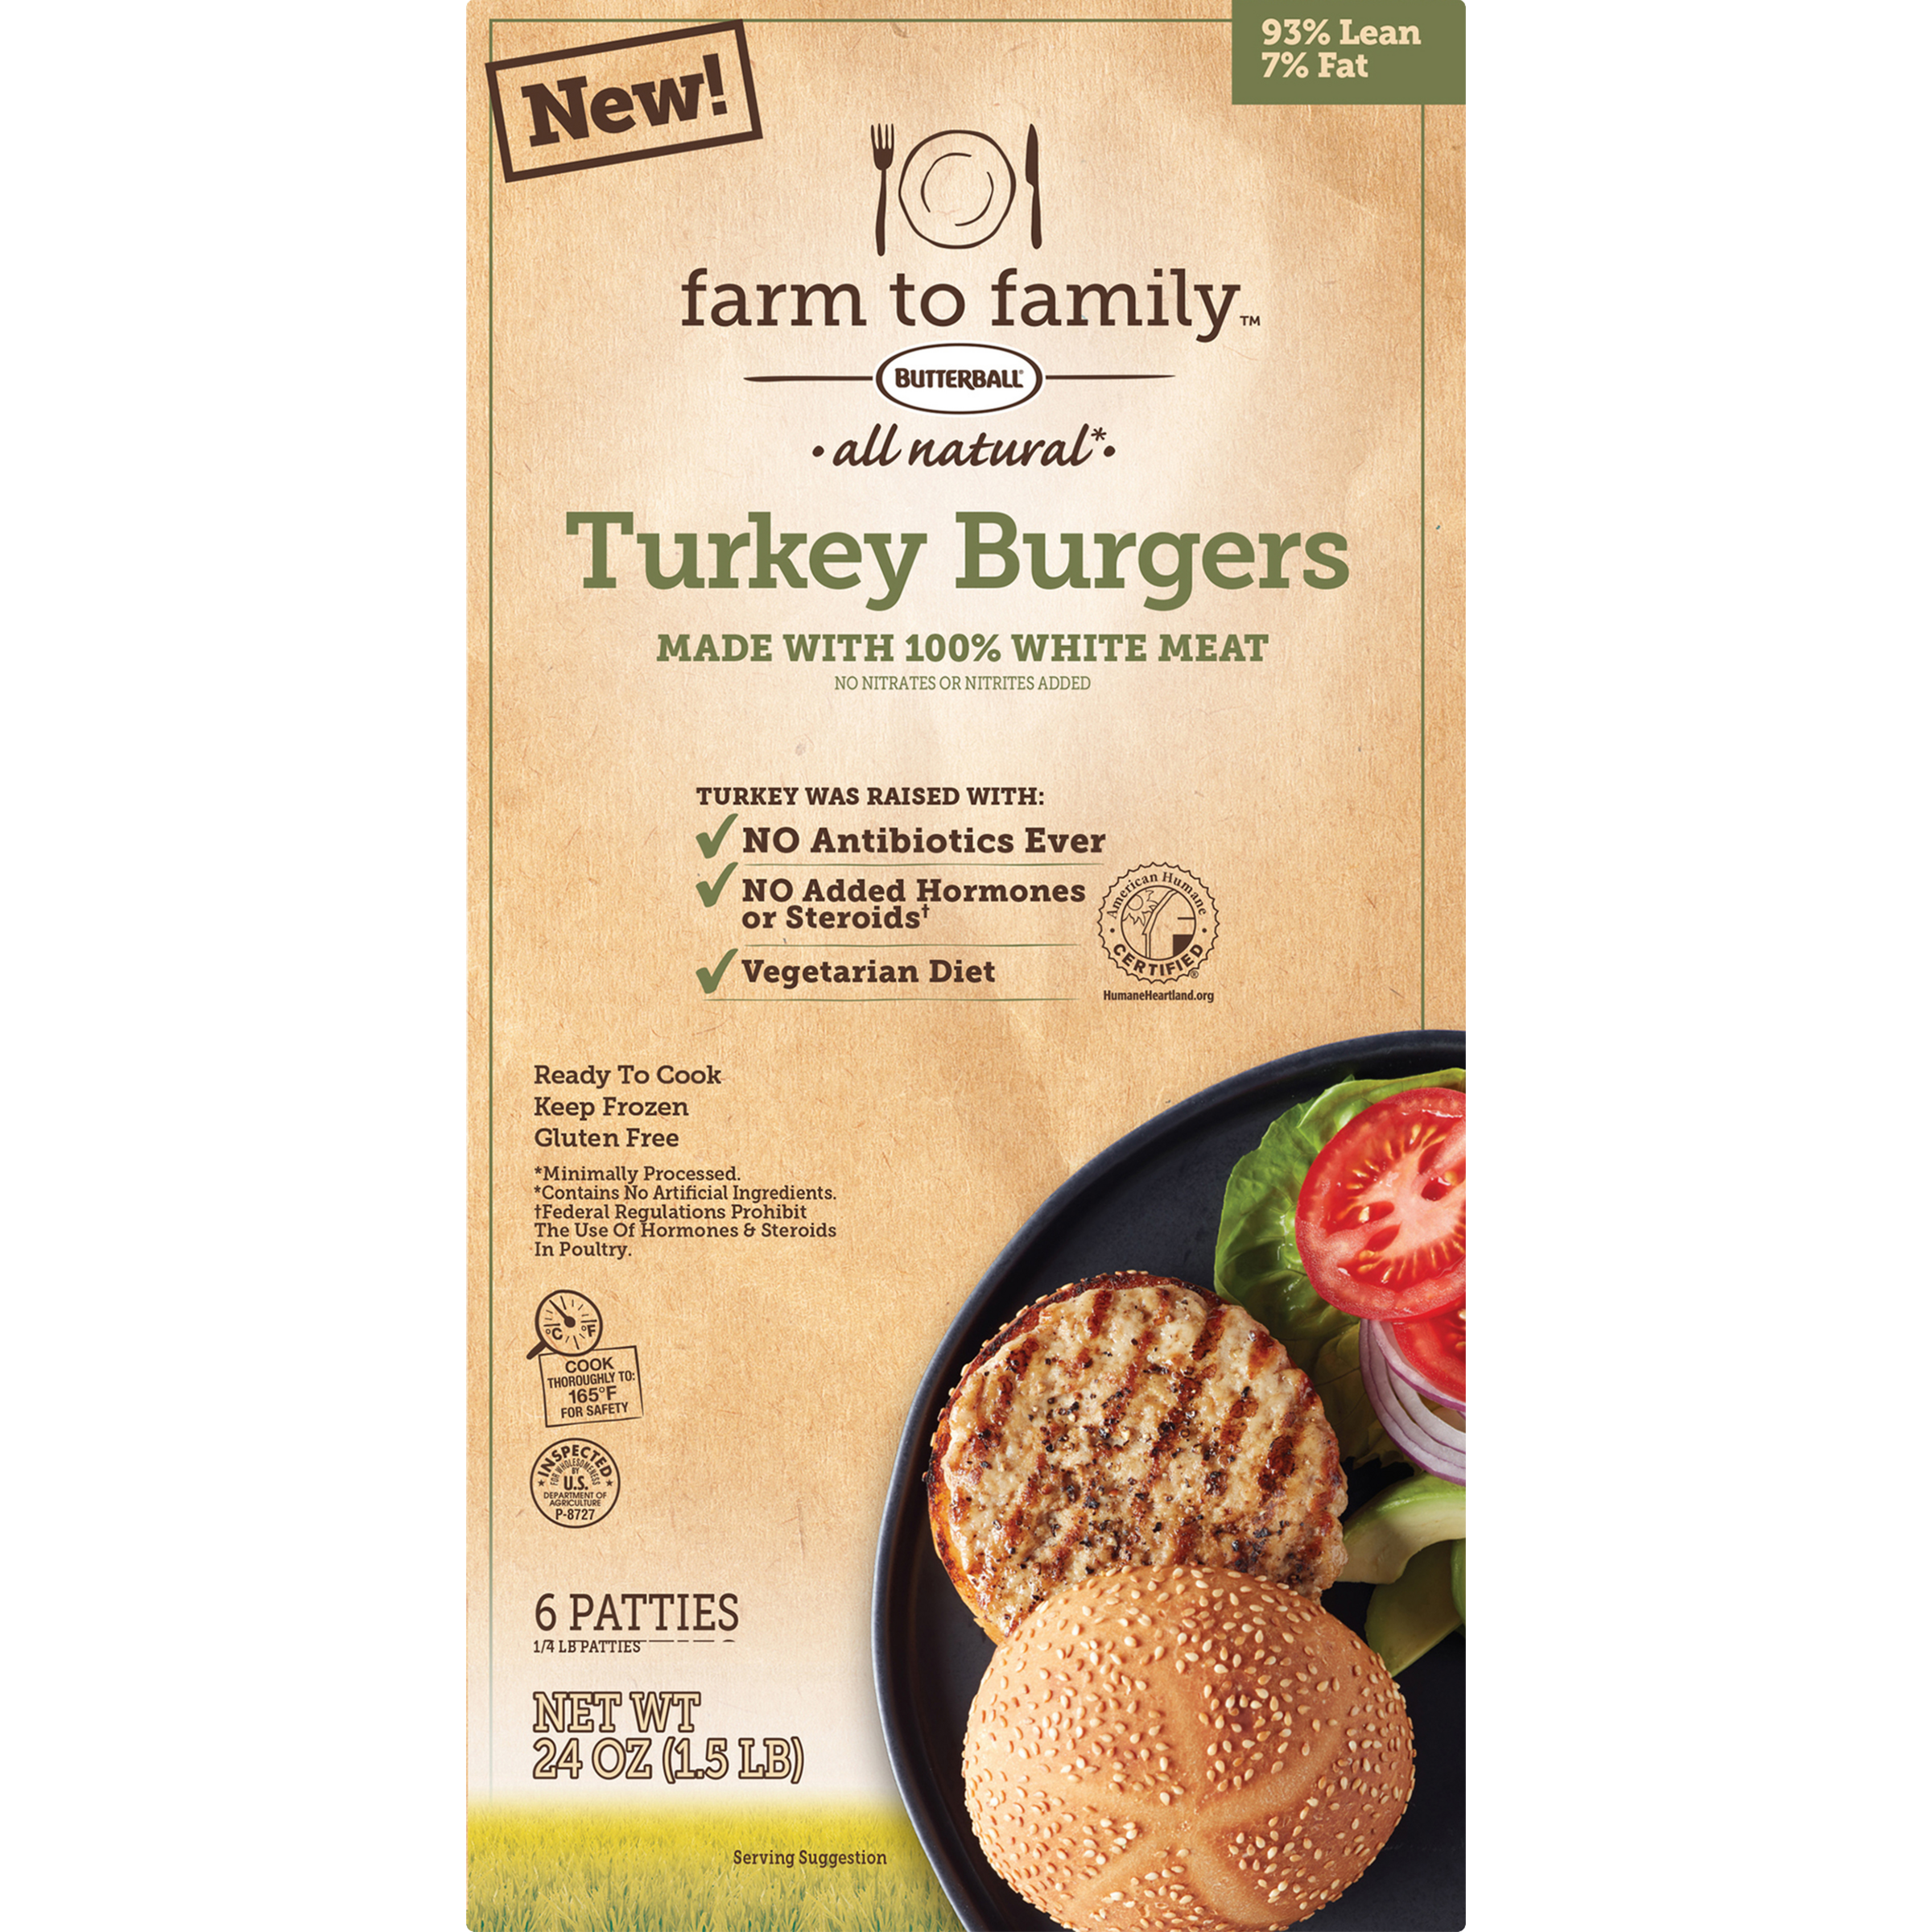 Ewg S Food Scores Butterball Farm To Family Turkey Burgers